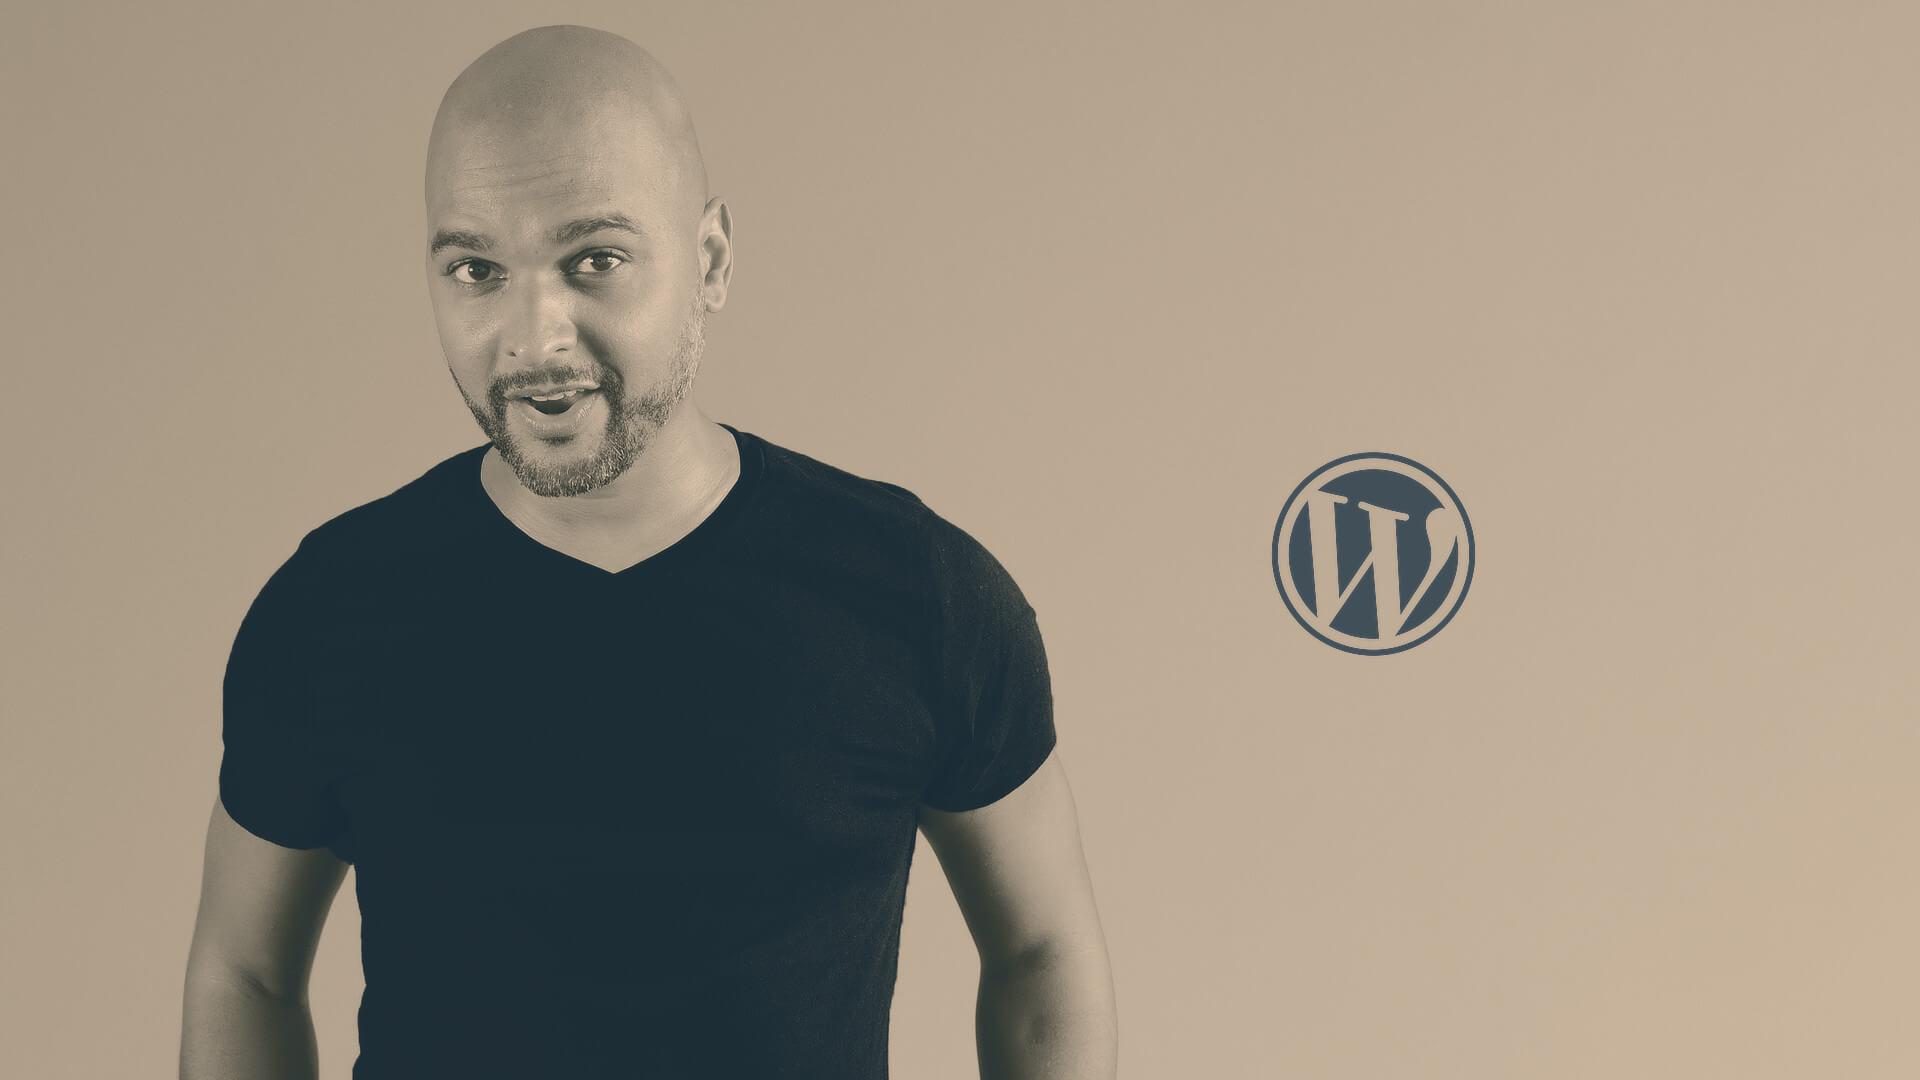 Selling Digital Products On Wordpress